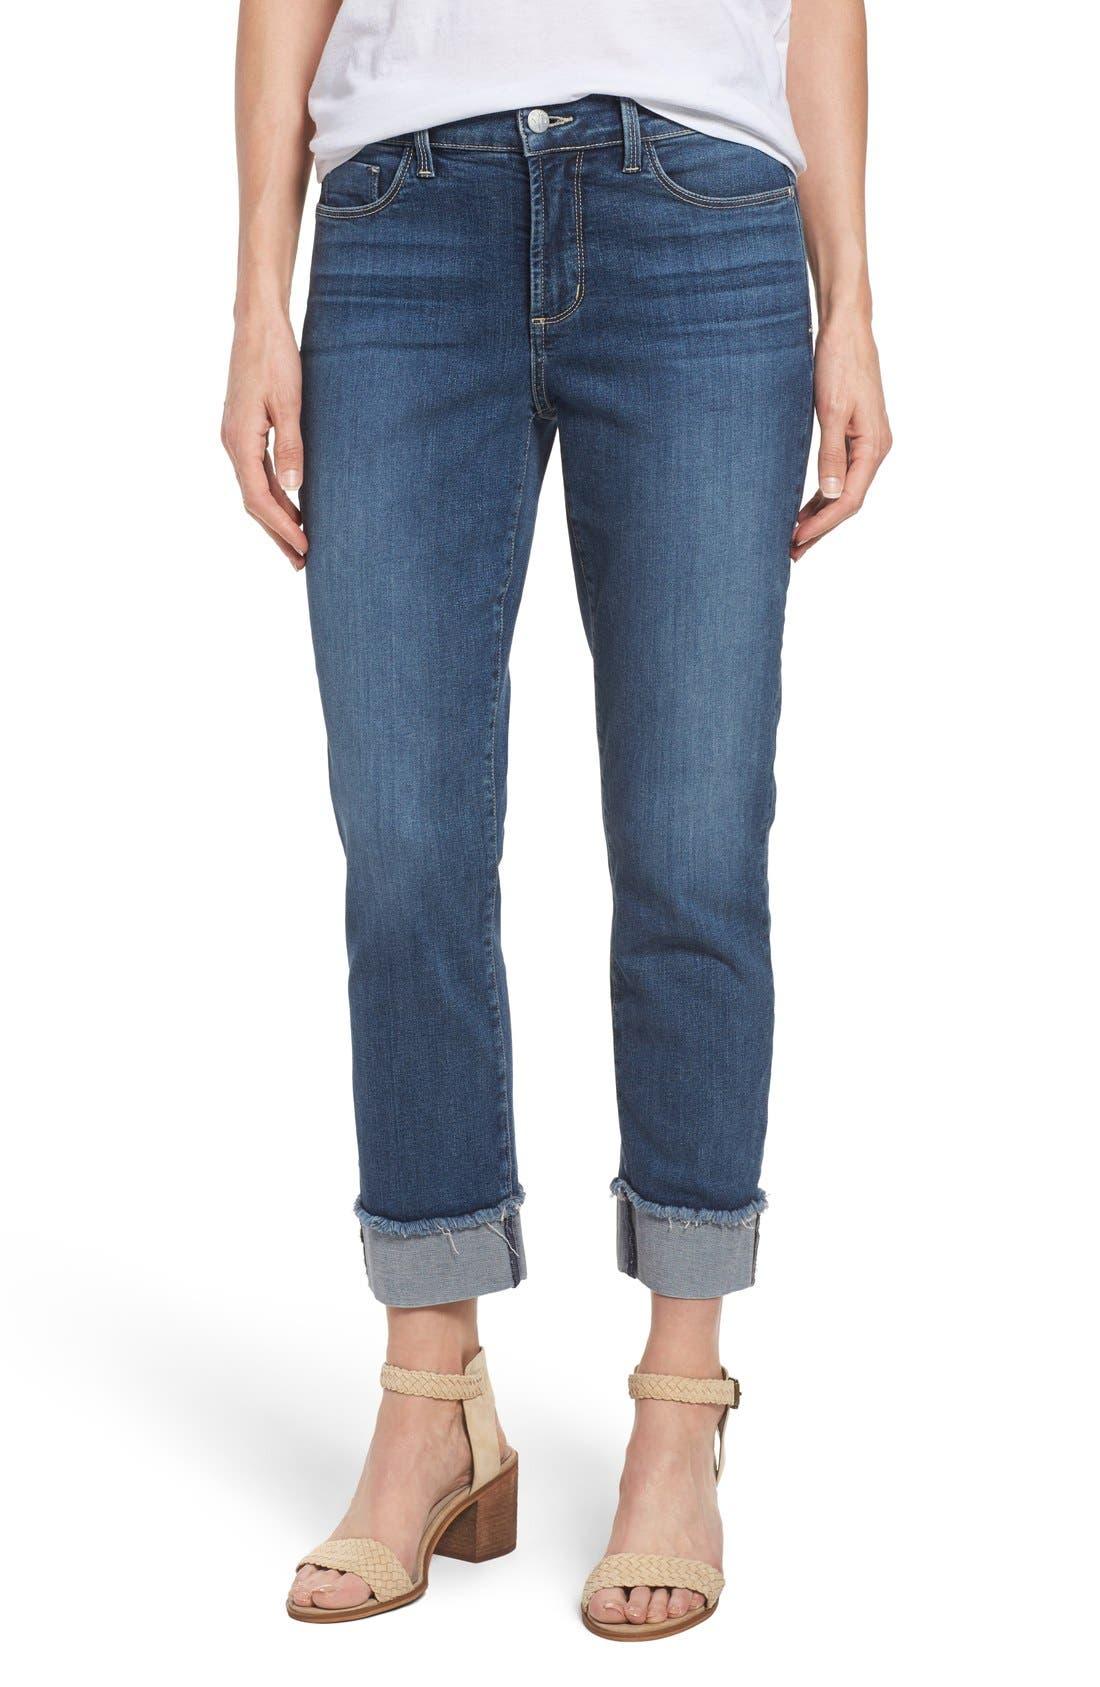 NYDJ 'Marnie' Stretch Cuffed Boyfriend Jeans